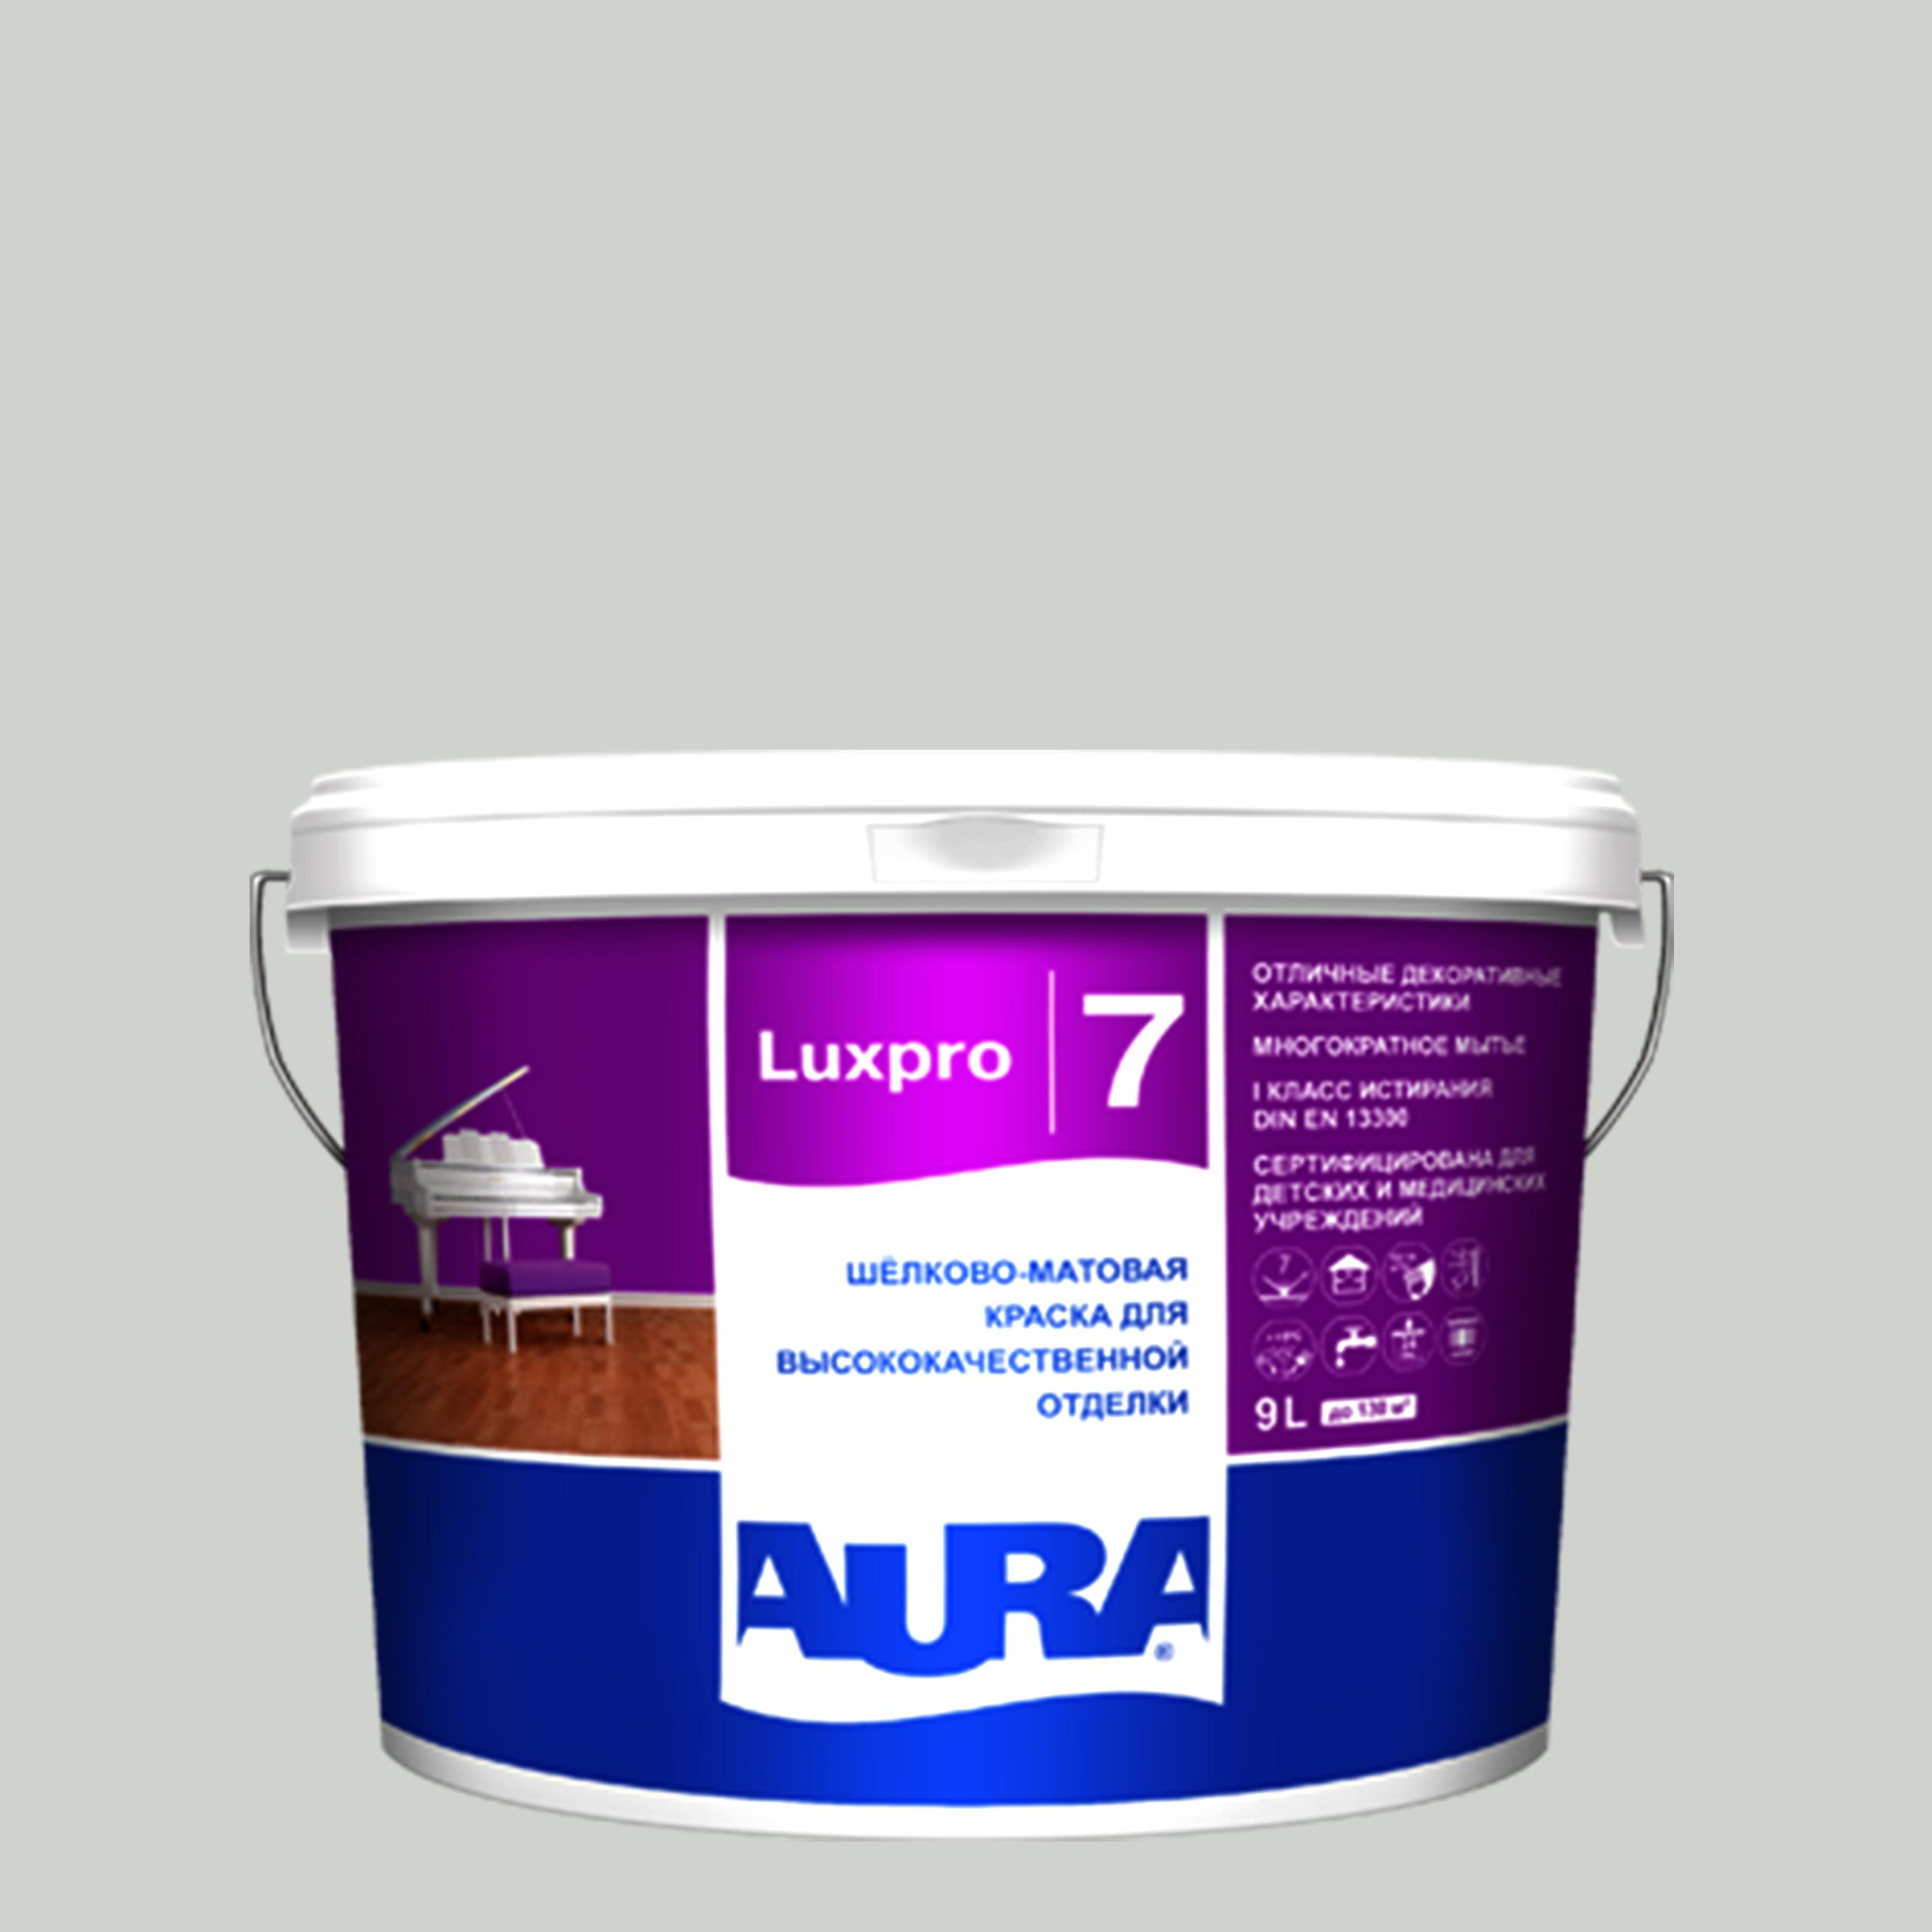 Фото 5 - Краска интерьерная, Aura LuxPRO 7, RAL 4009, 11 кг.